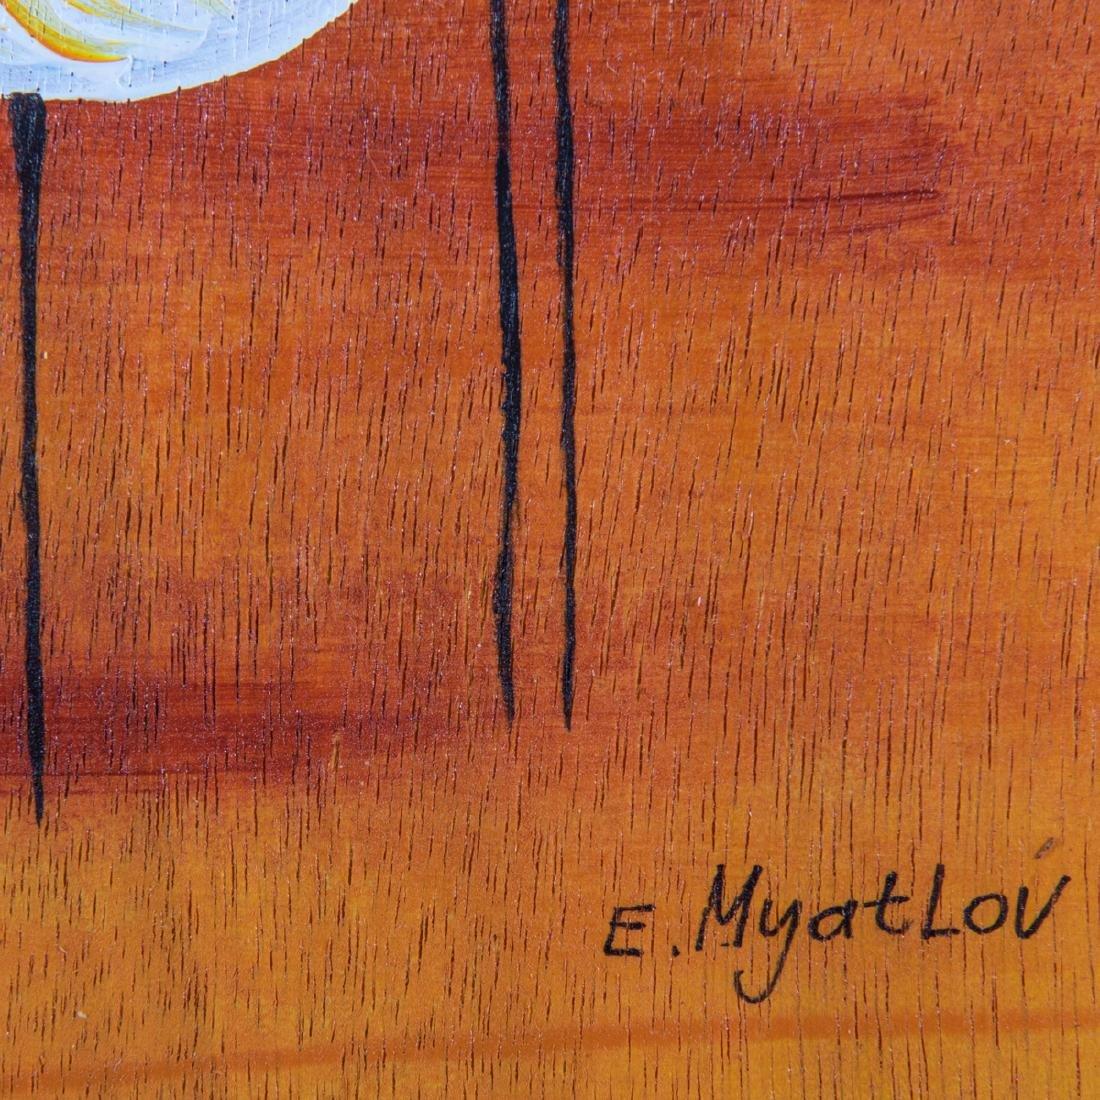 Ester Myatlov (b. 1976) 'Inspiration' and 'Love on a - 10